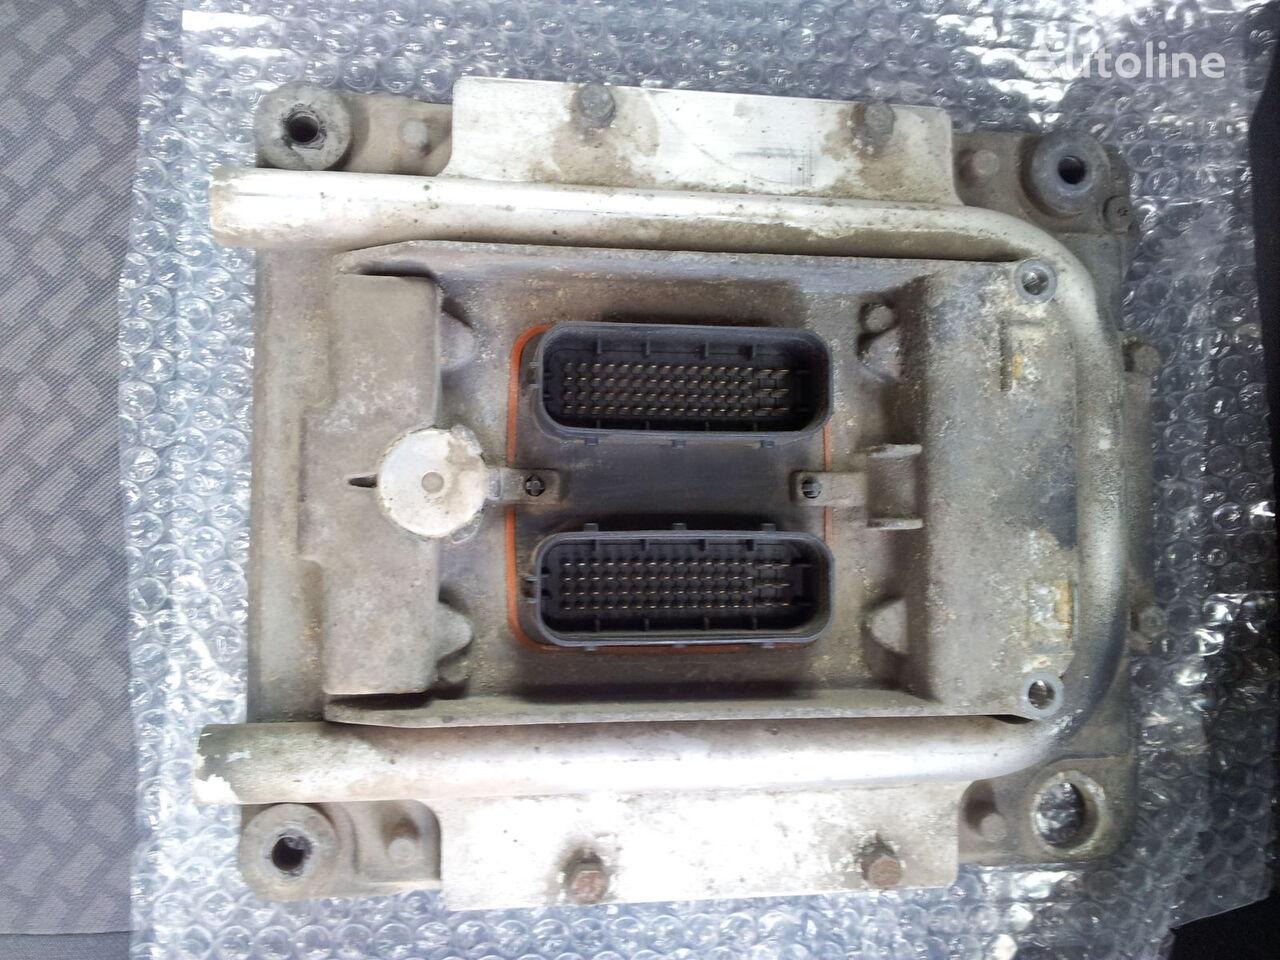 Renault ECU control unit, engine control unit, 20814604 P01 bloco de controlo para RENAULT Premium DXI camião tractor